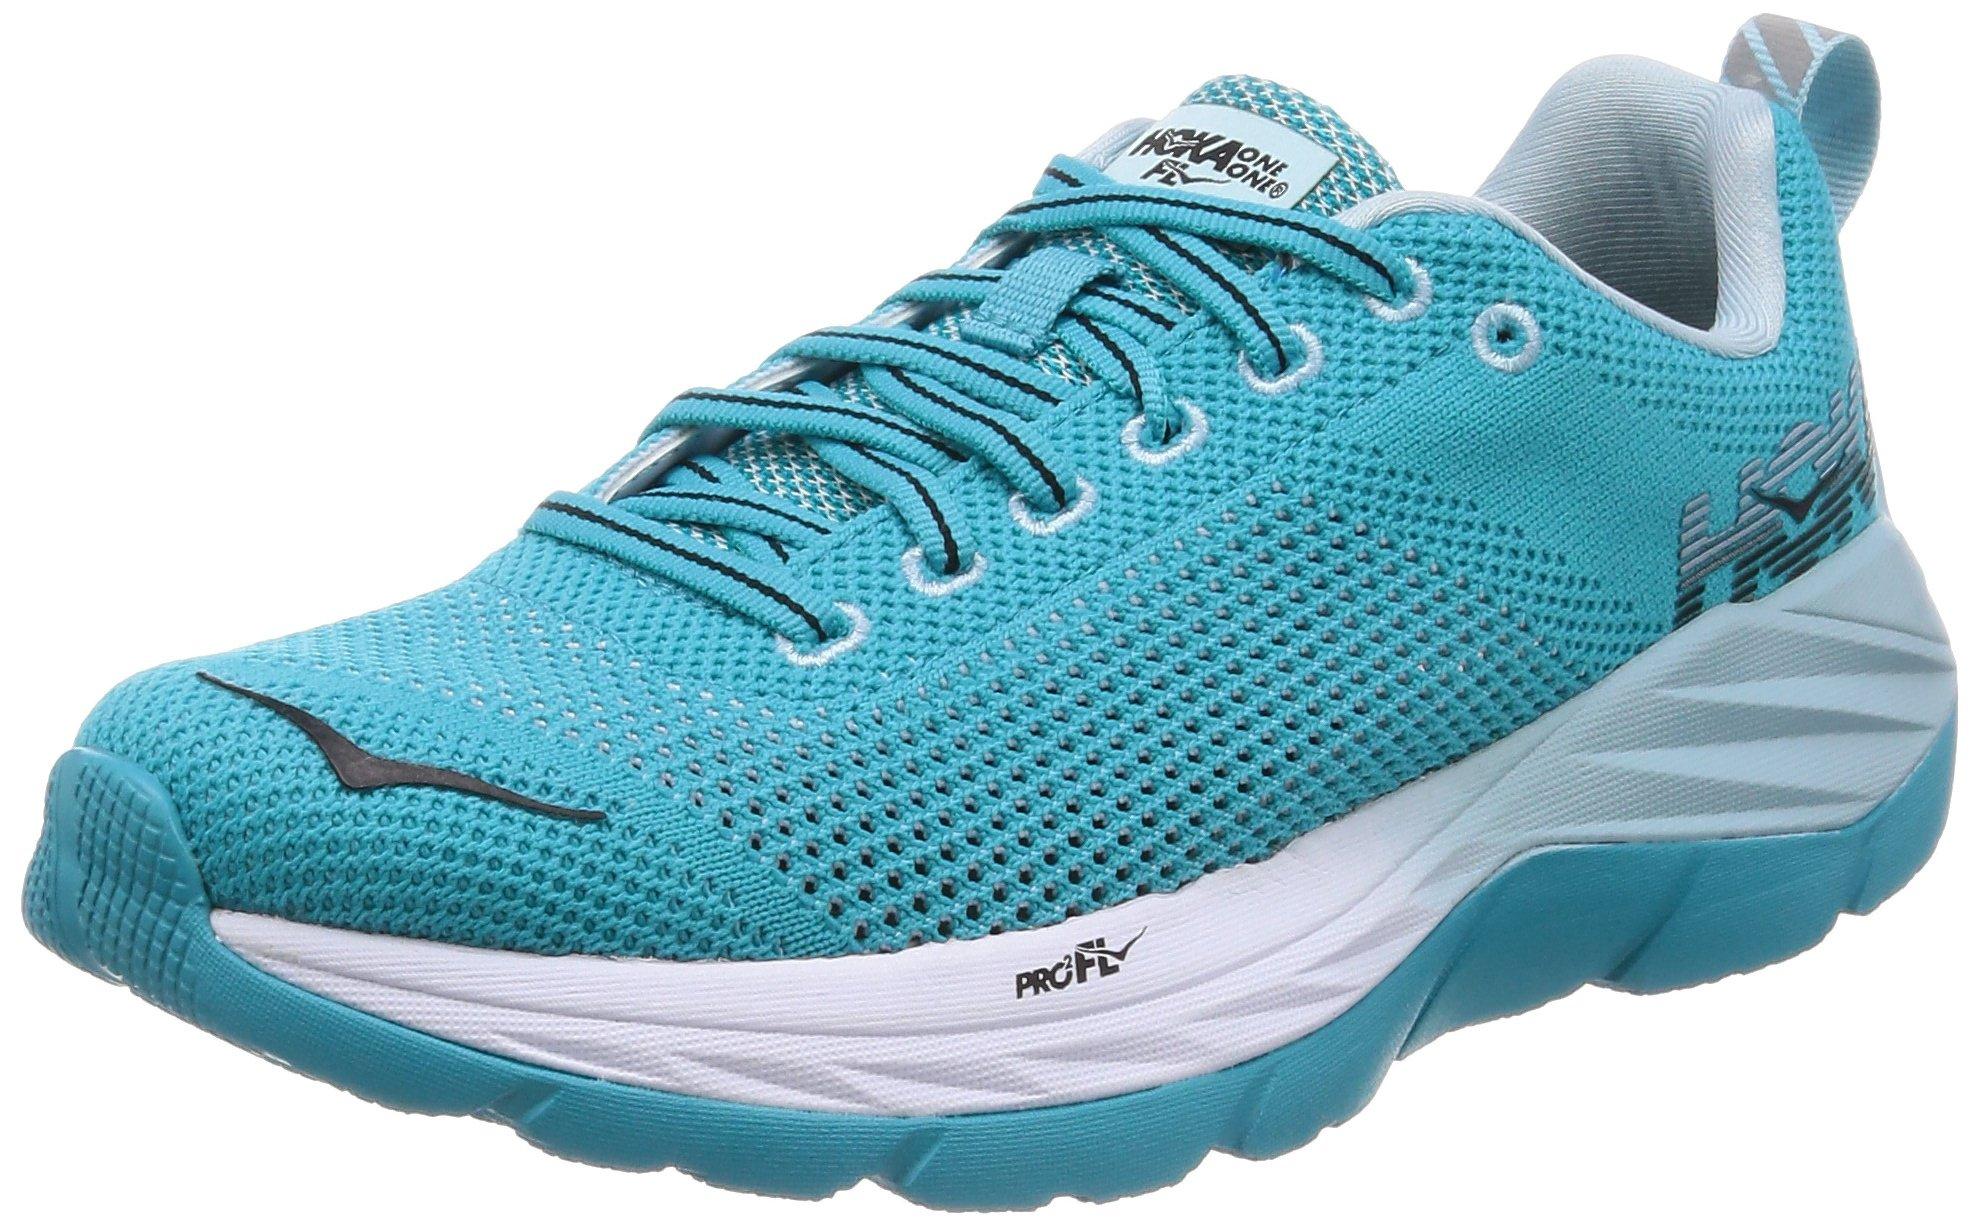 HOKA ONE ONE Women's Mach Bluebird/White Running Shoe Size 8 M US by HOKA ONE ONE